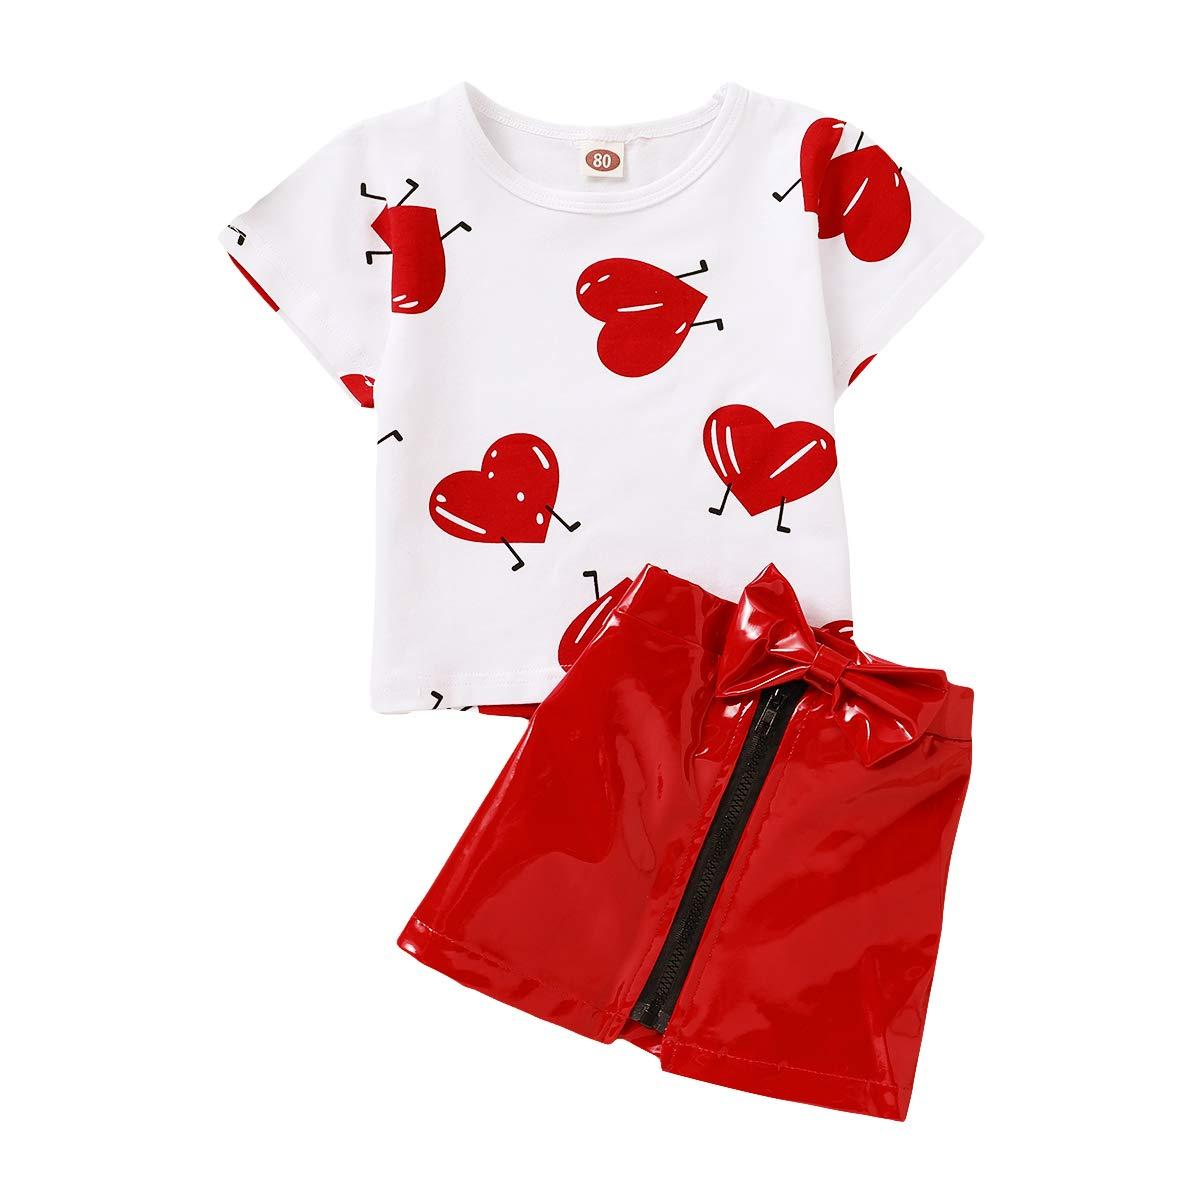 Toddler Baby Girls 2pc Leather Skirt Set Red T-Shirt Top+Red Zipper Short Dress Clothes Set